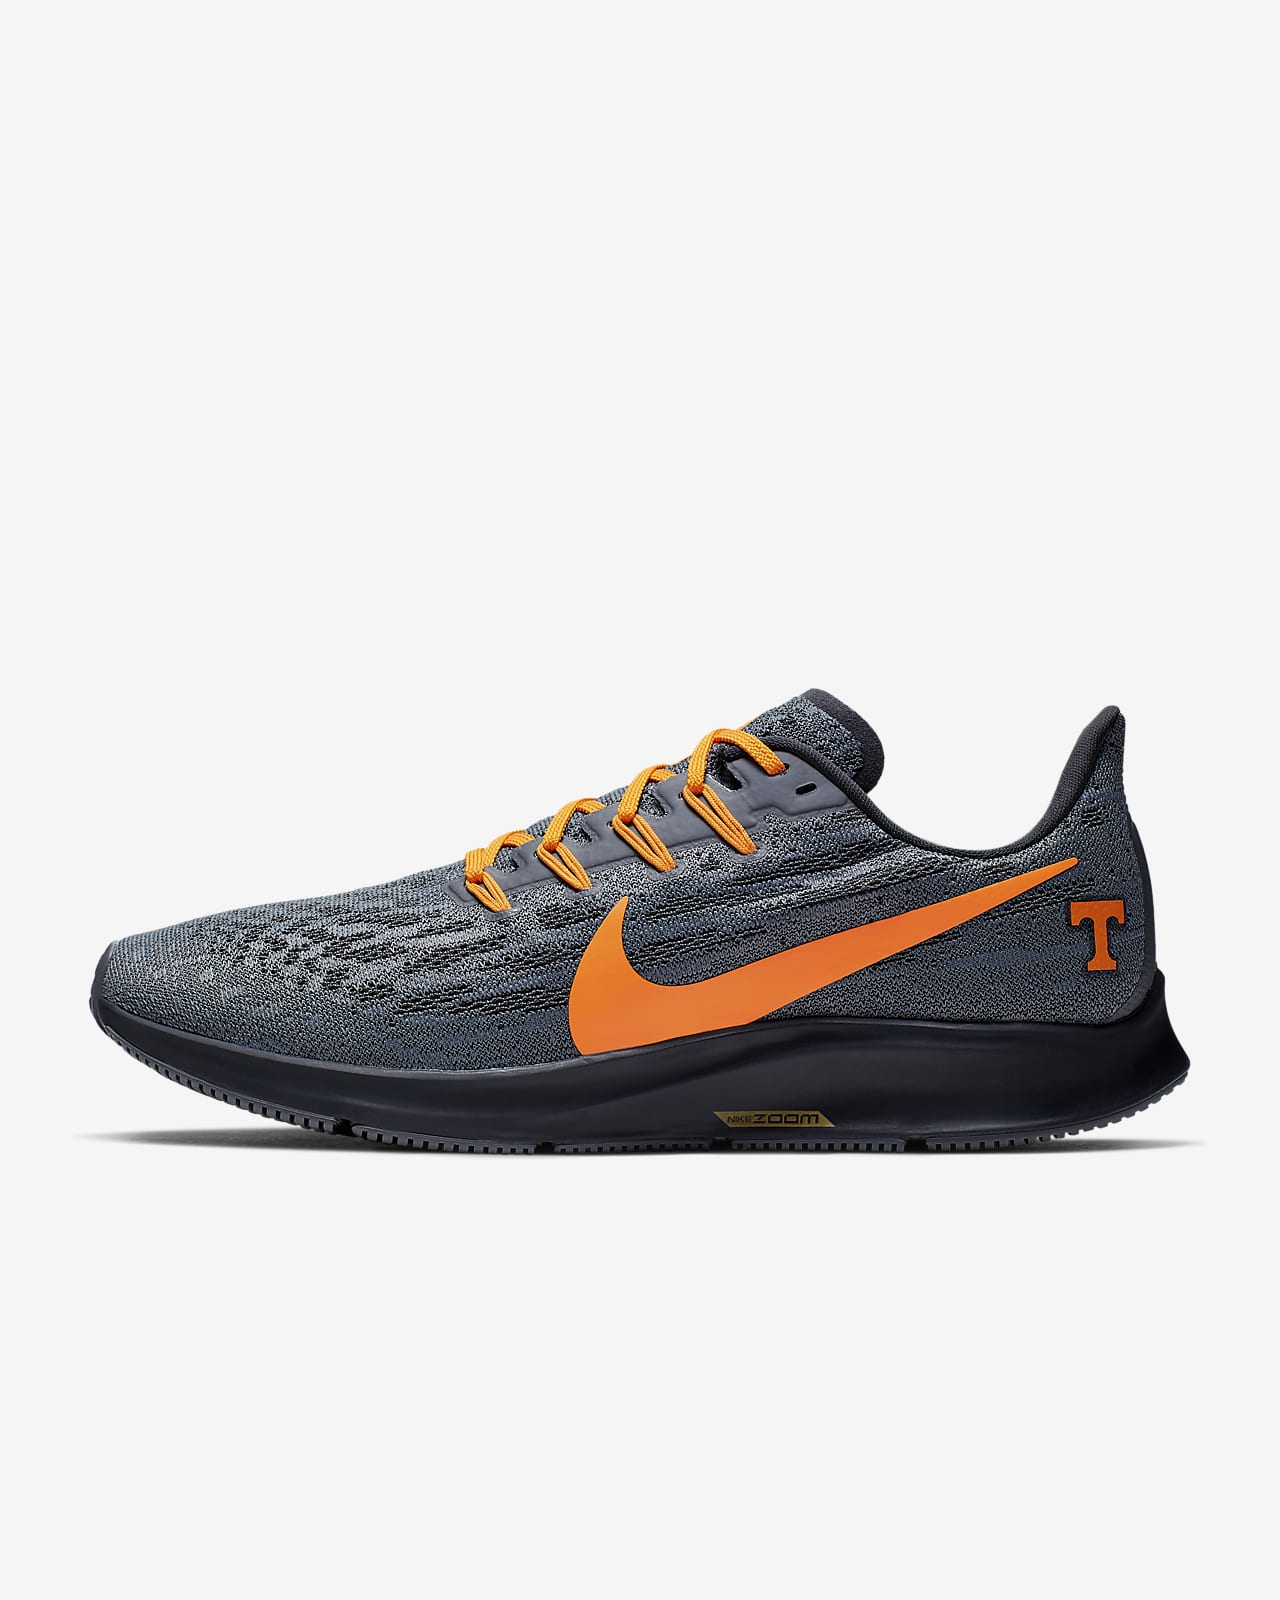 Calzado de running para hombre Nike Air Zoom Pegasus 36 (Tennessee)